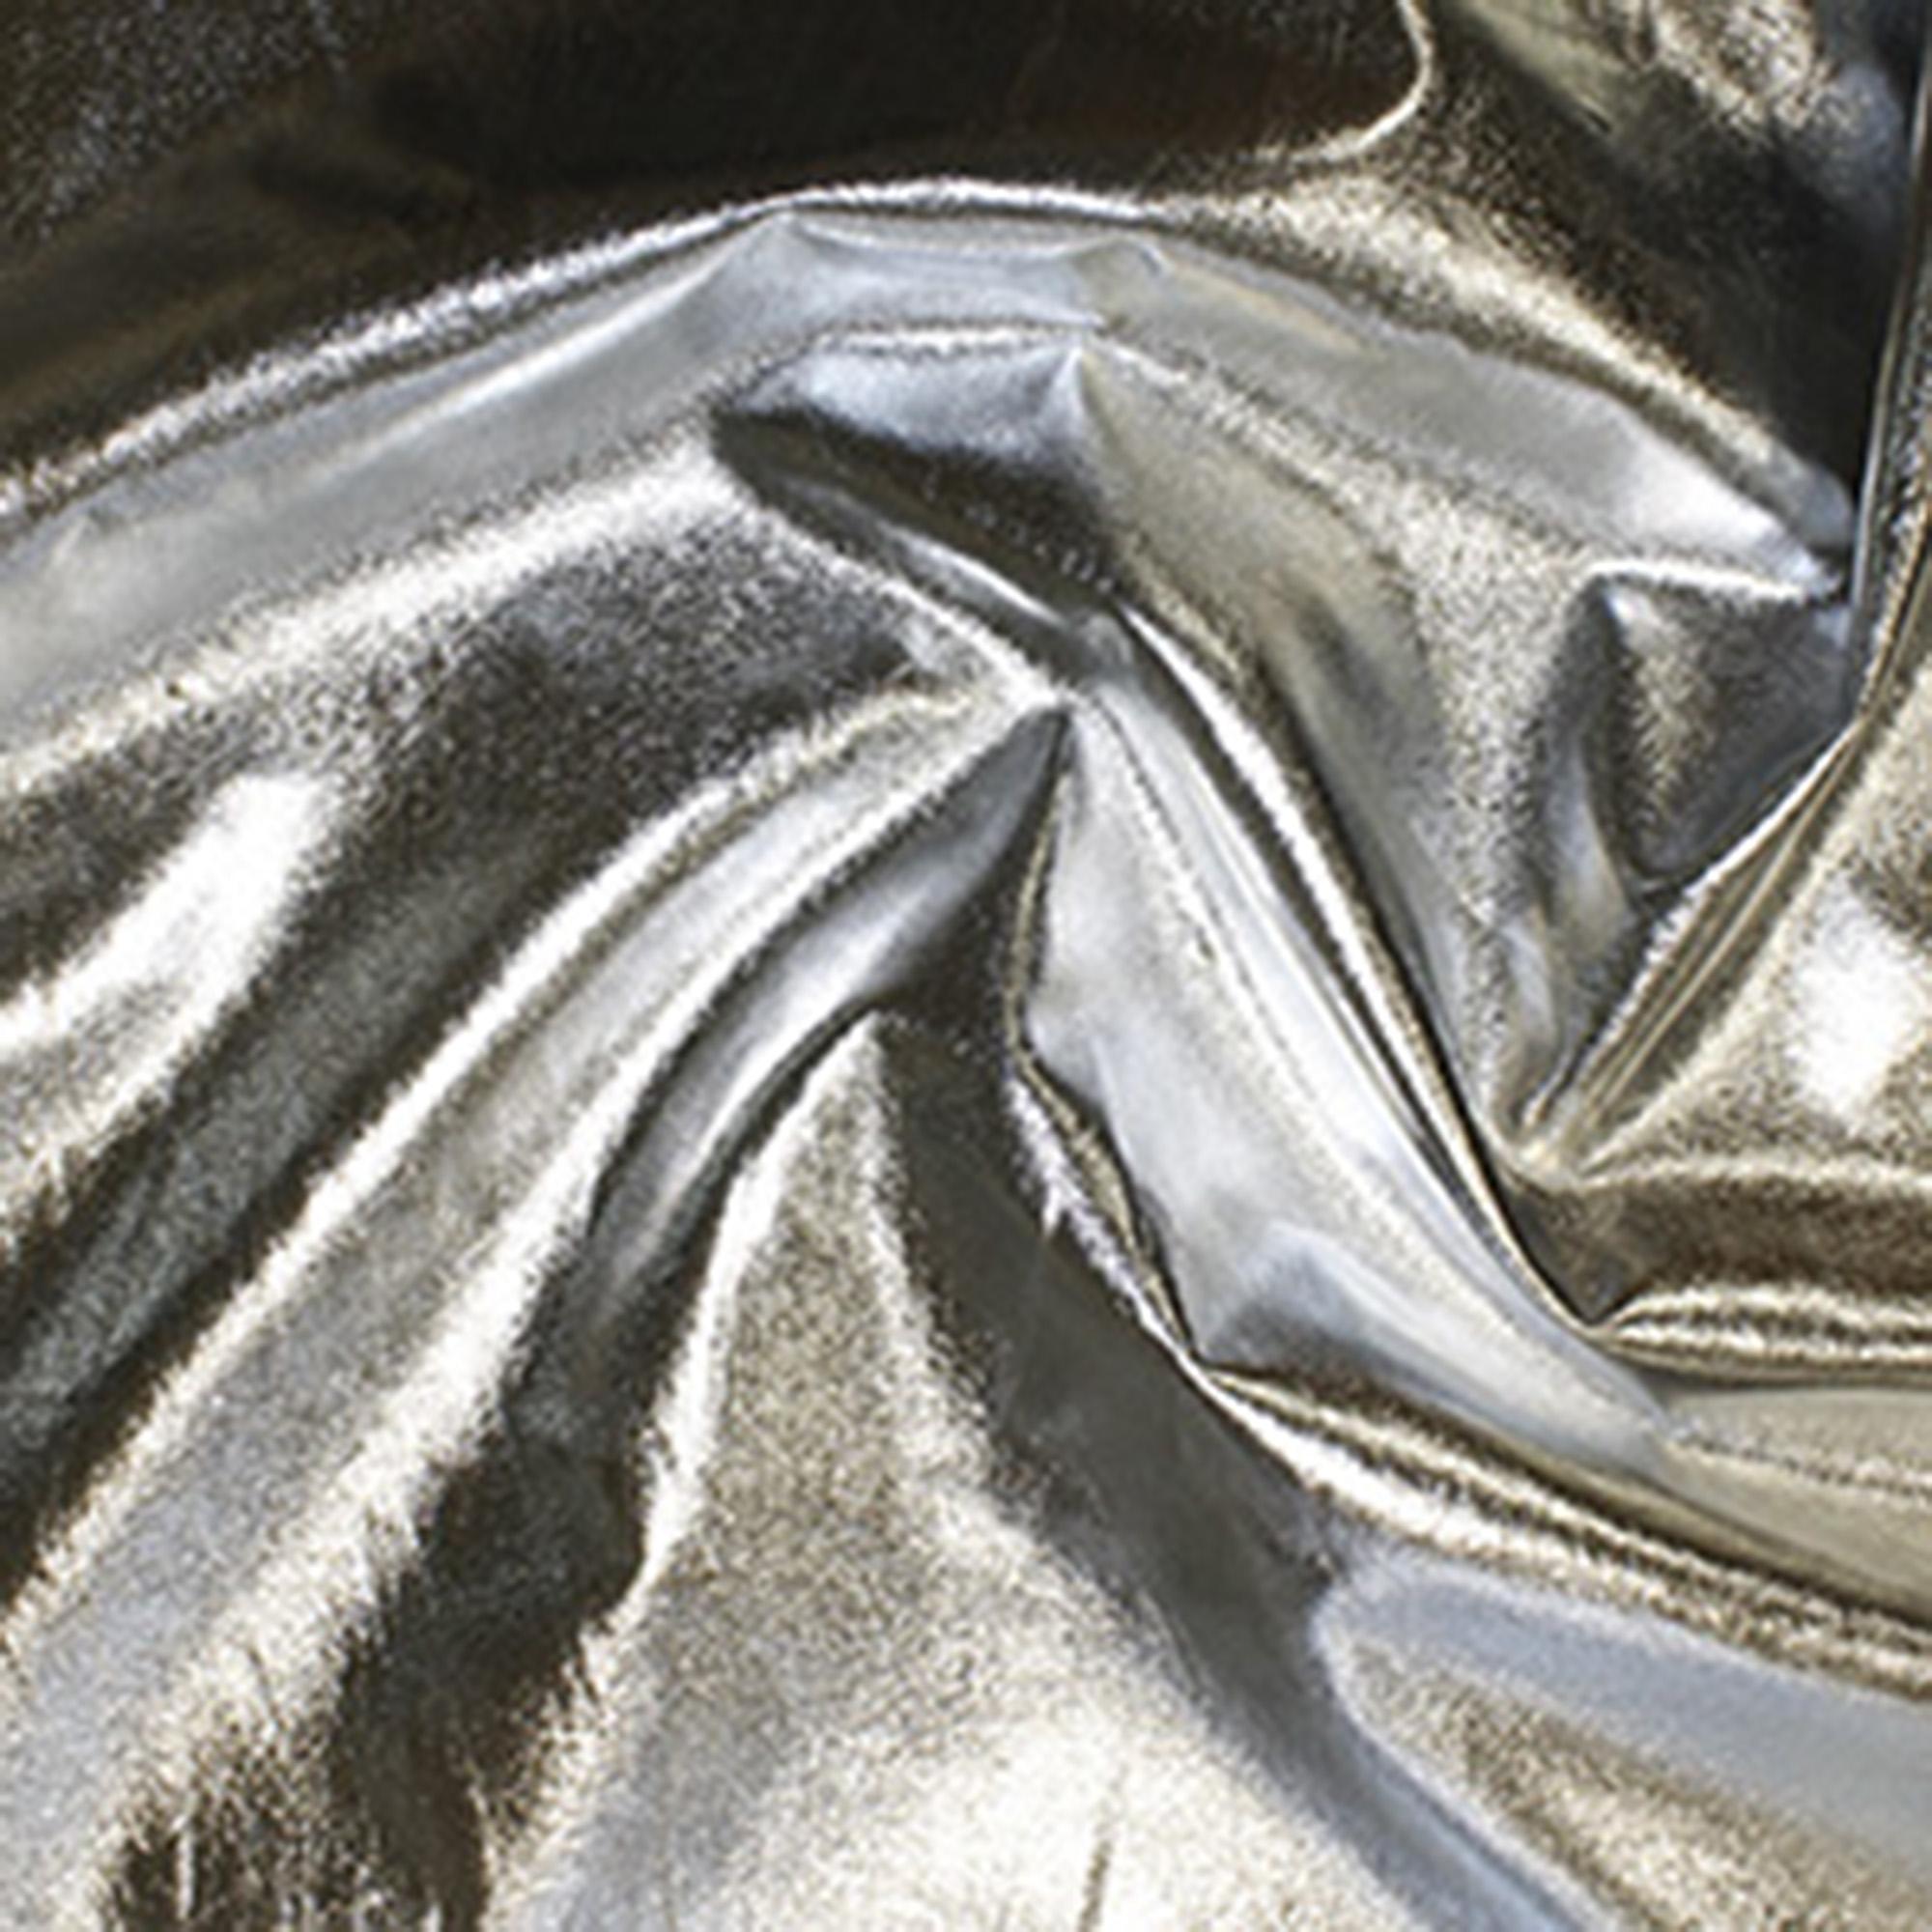 Silver Metallic Fabric, Fat Quarter, also known as Emperor Foil